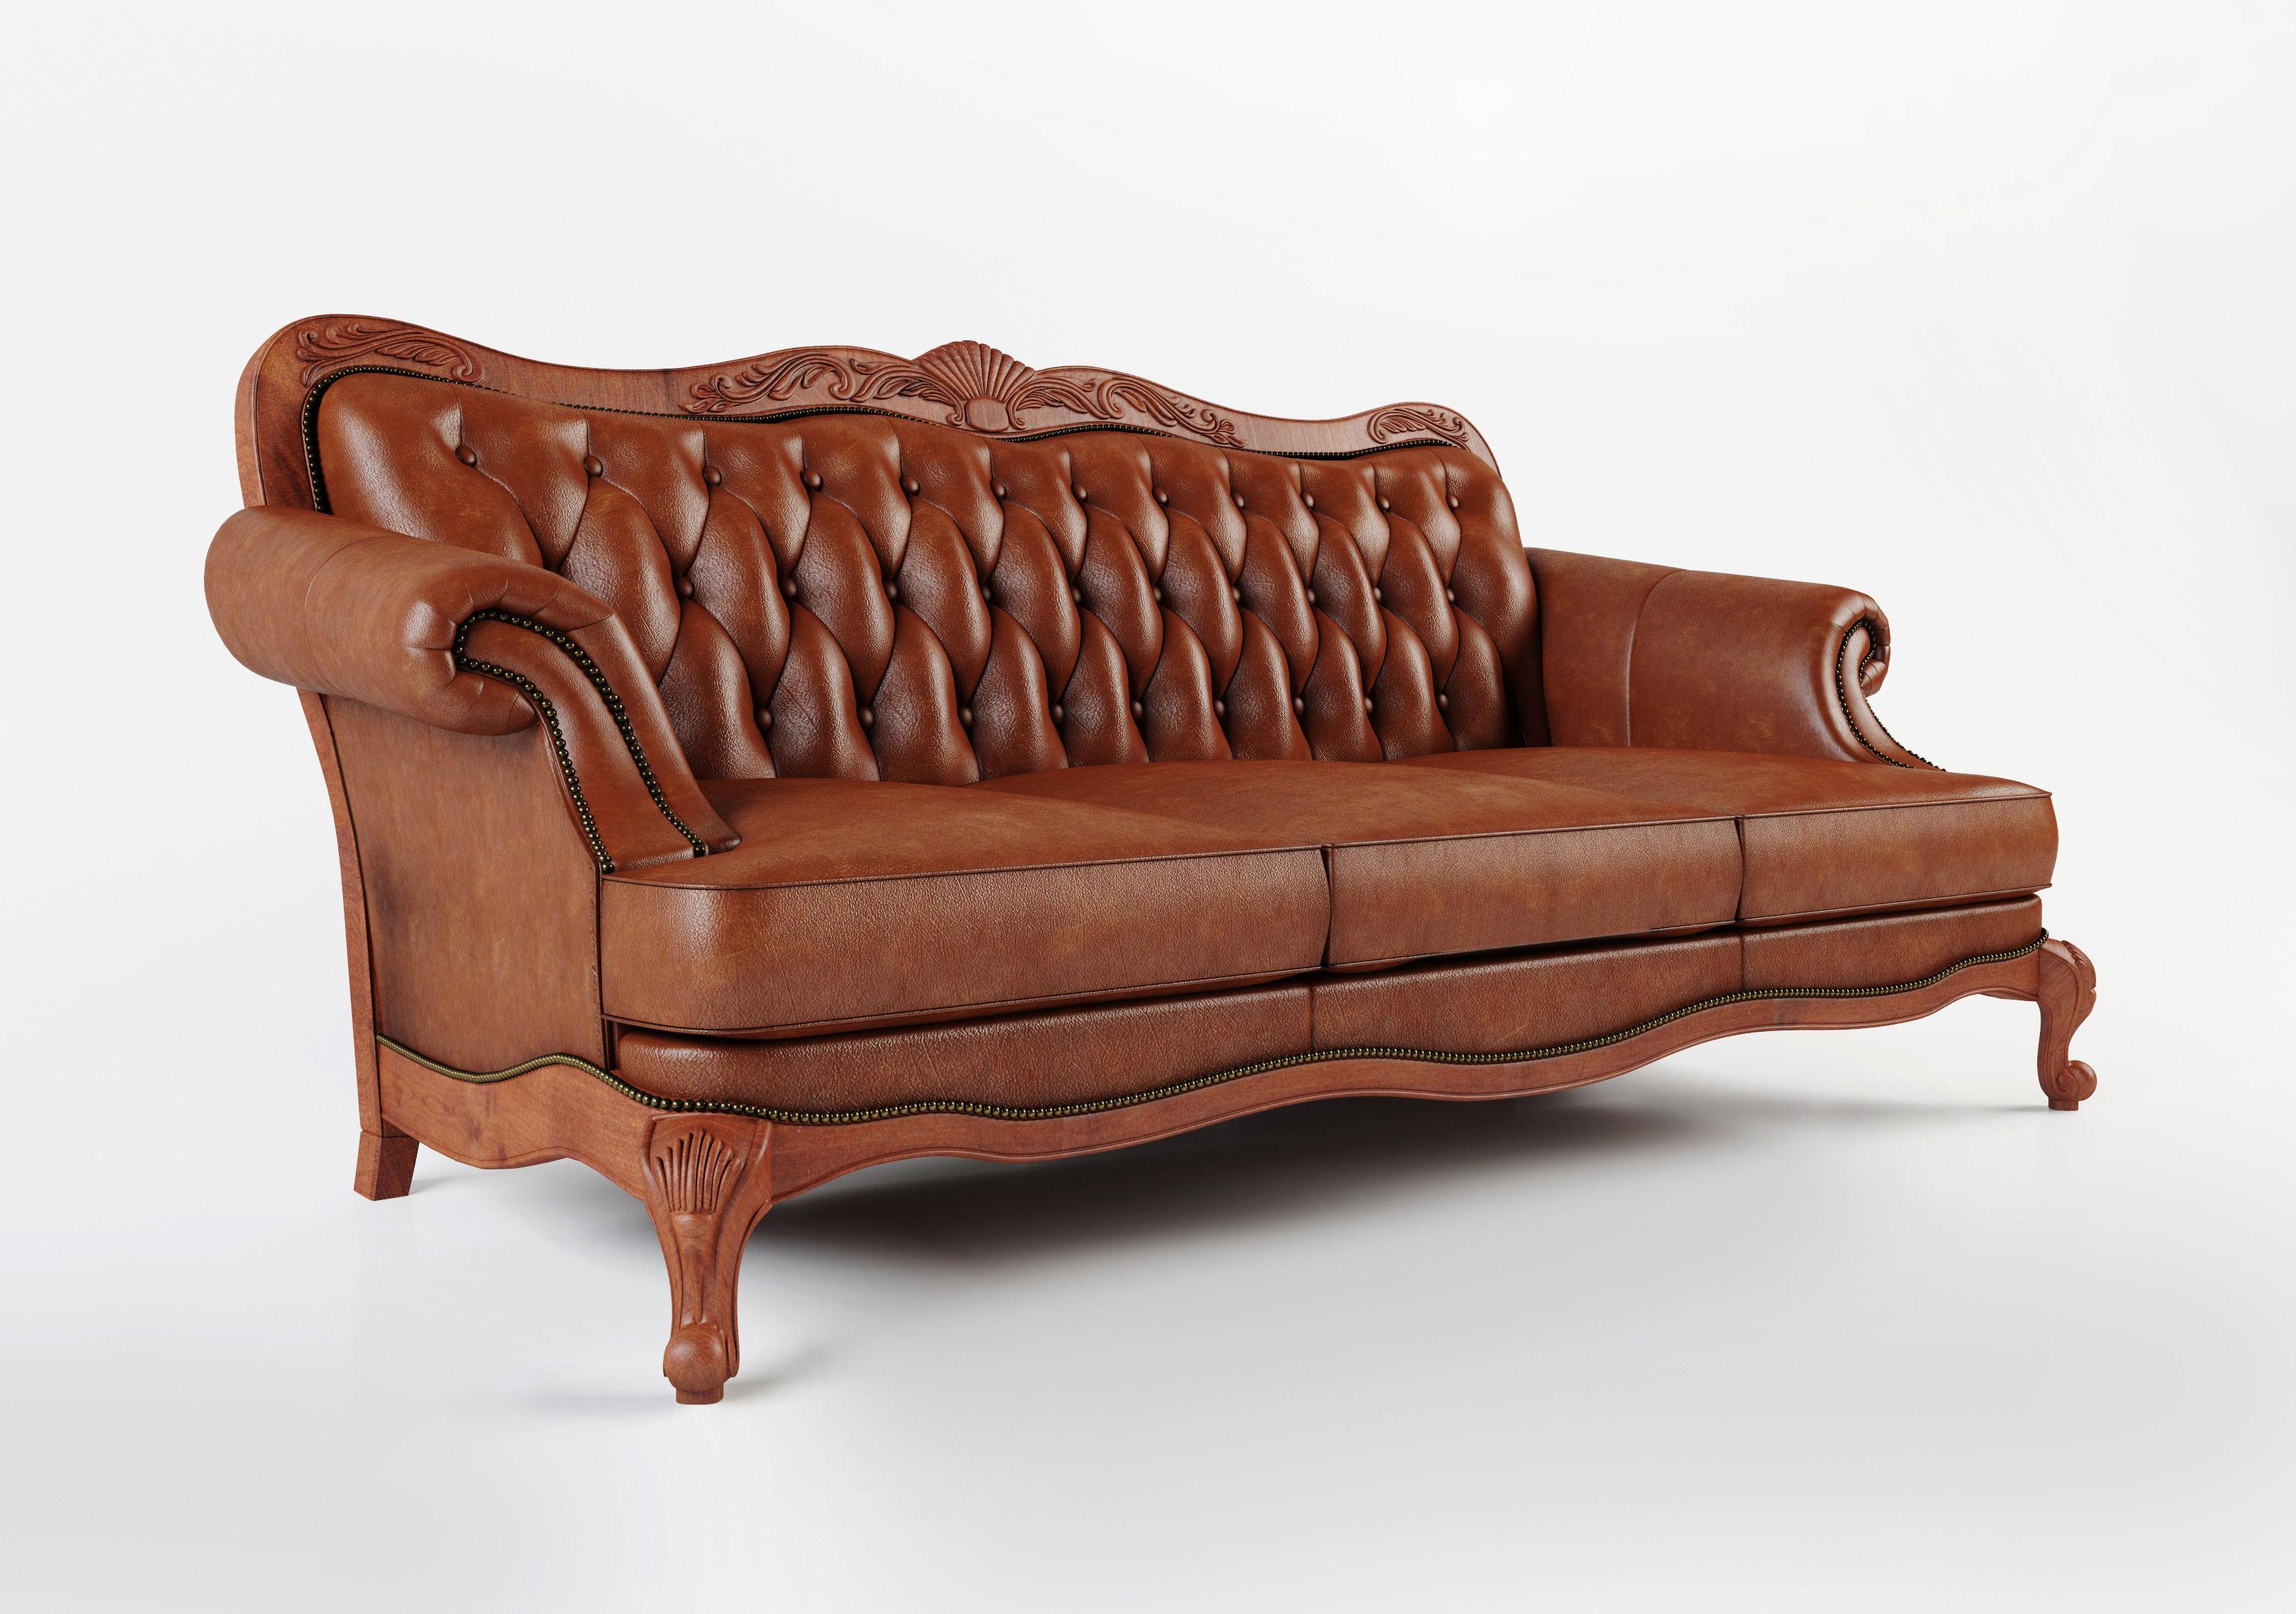 Victoria Sofa By Coaster Home Furnishings Model Max Obj Mtl S Fbx 2